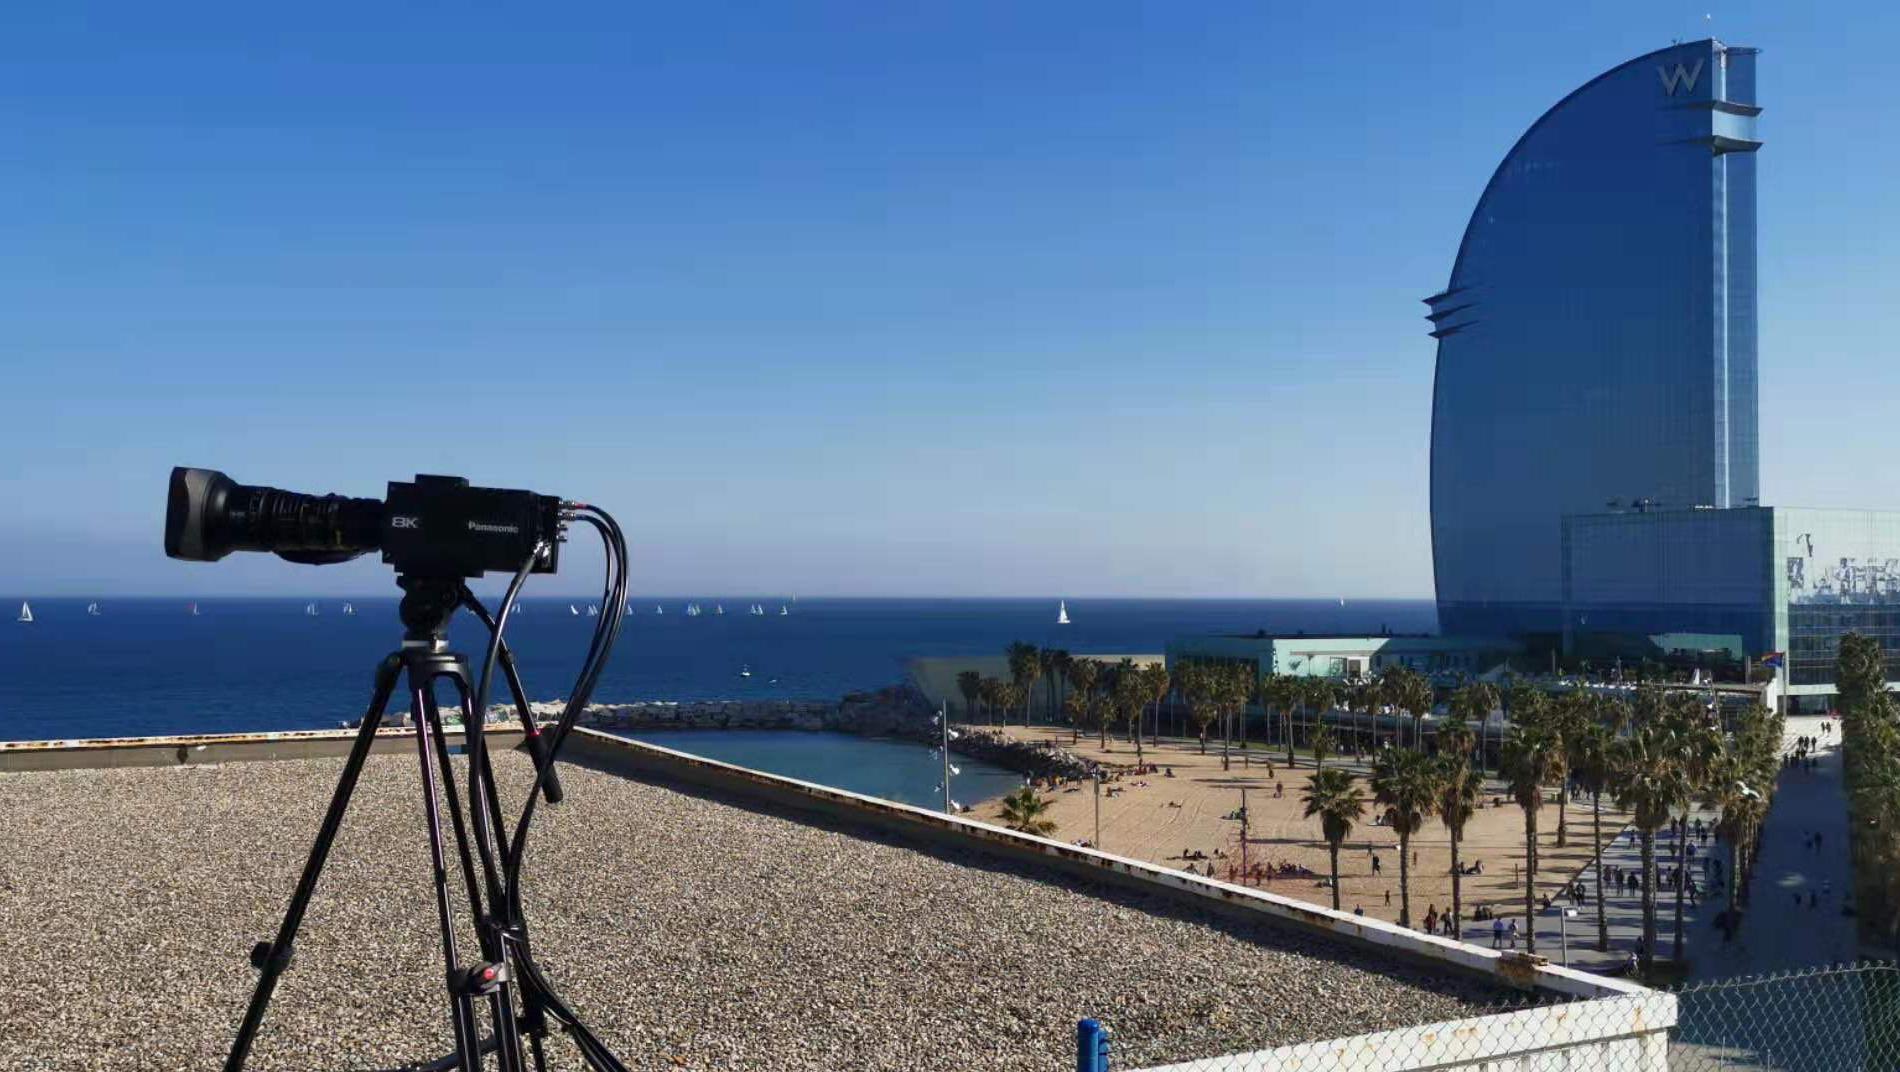 """MWC19巴塞罗那通讯展""华为5G+8K直播项目"